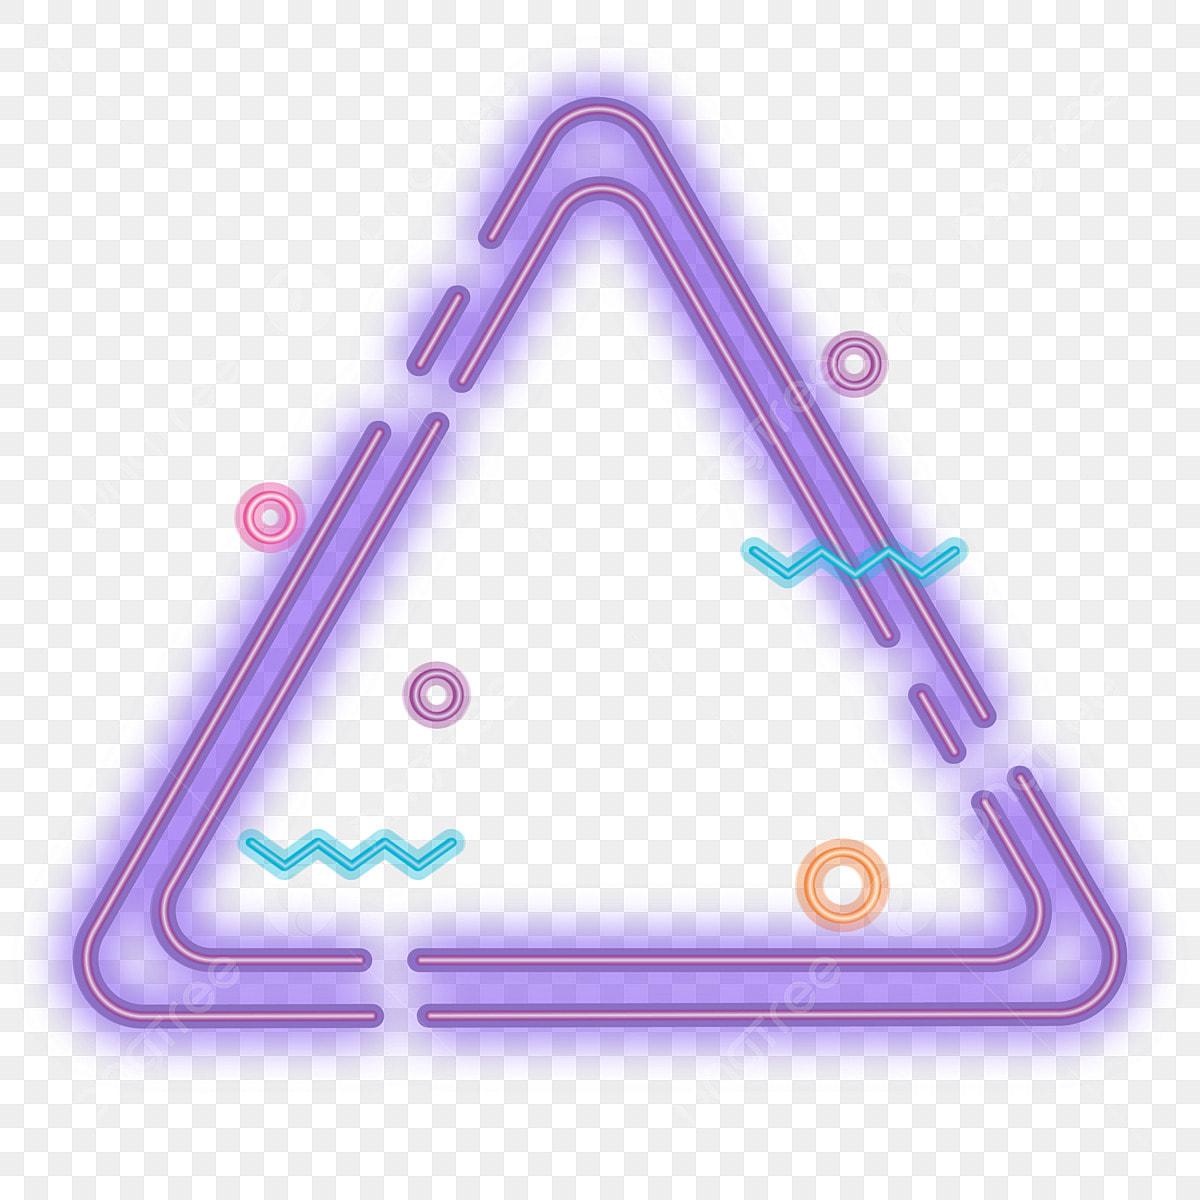 Frame Neon Light Effect Illuminate Triangle, Purple, Dream, Fashion